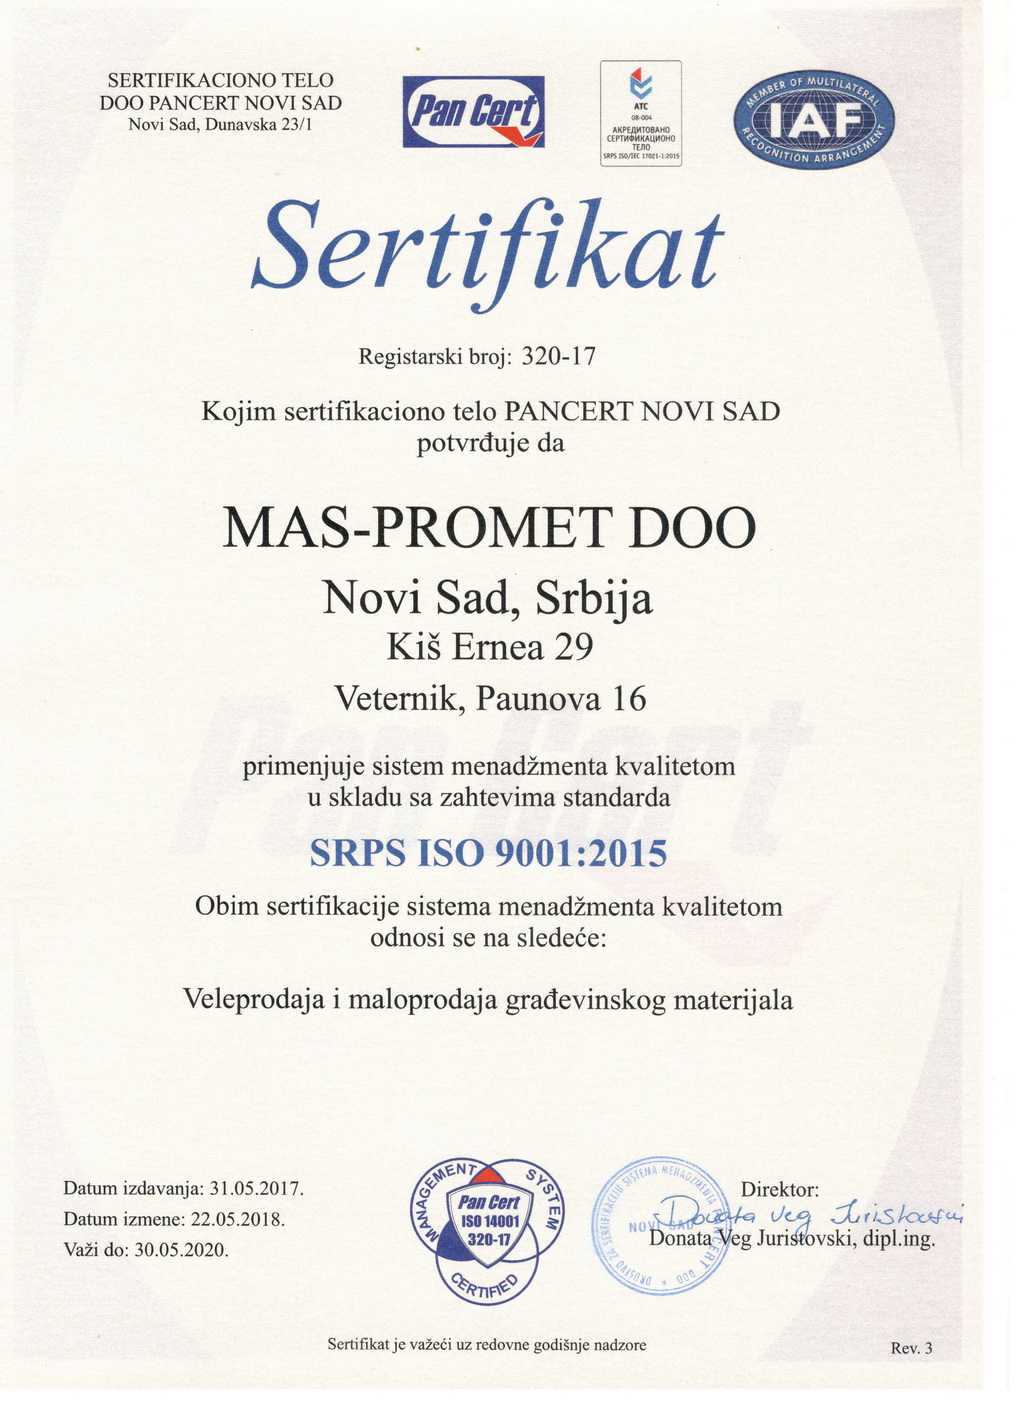 Sertifikat ISO 9001 - 2015